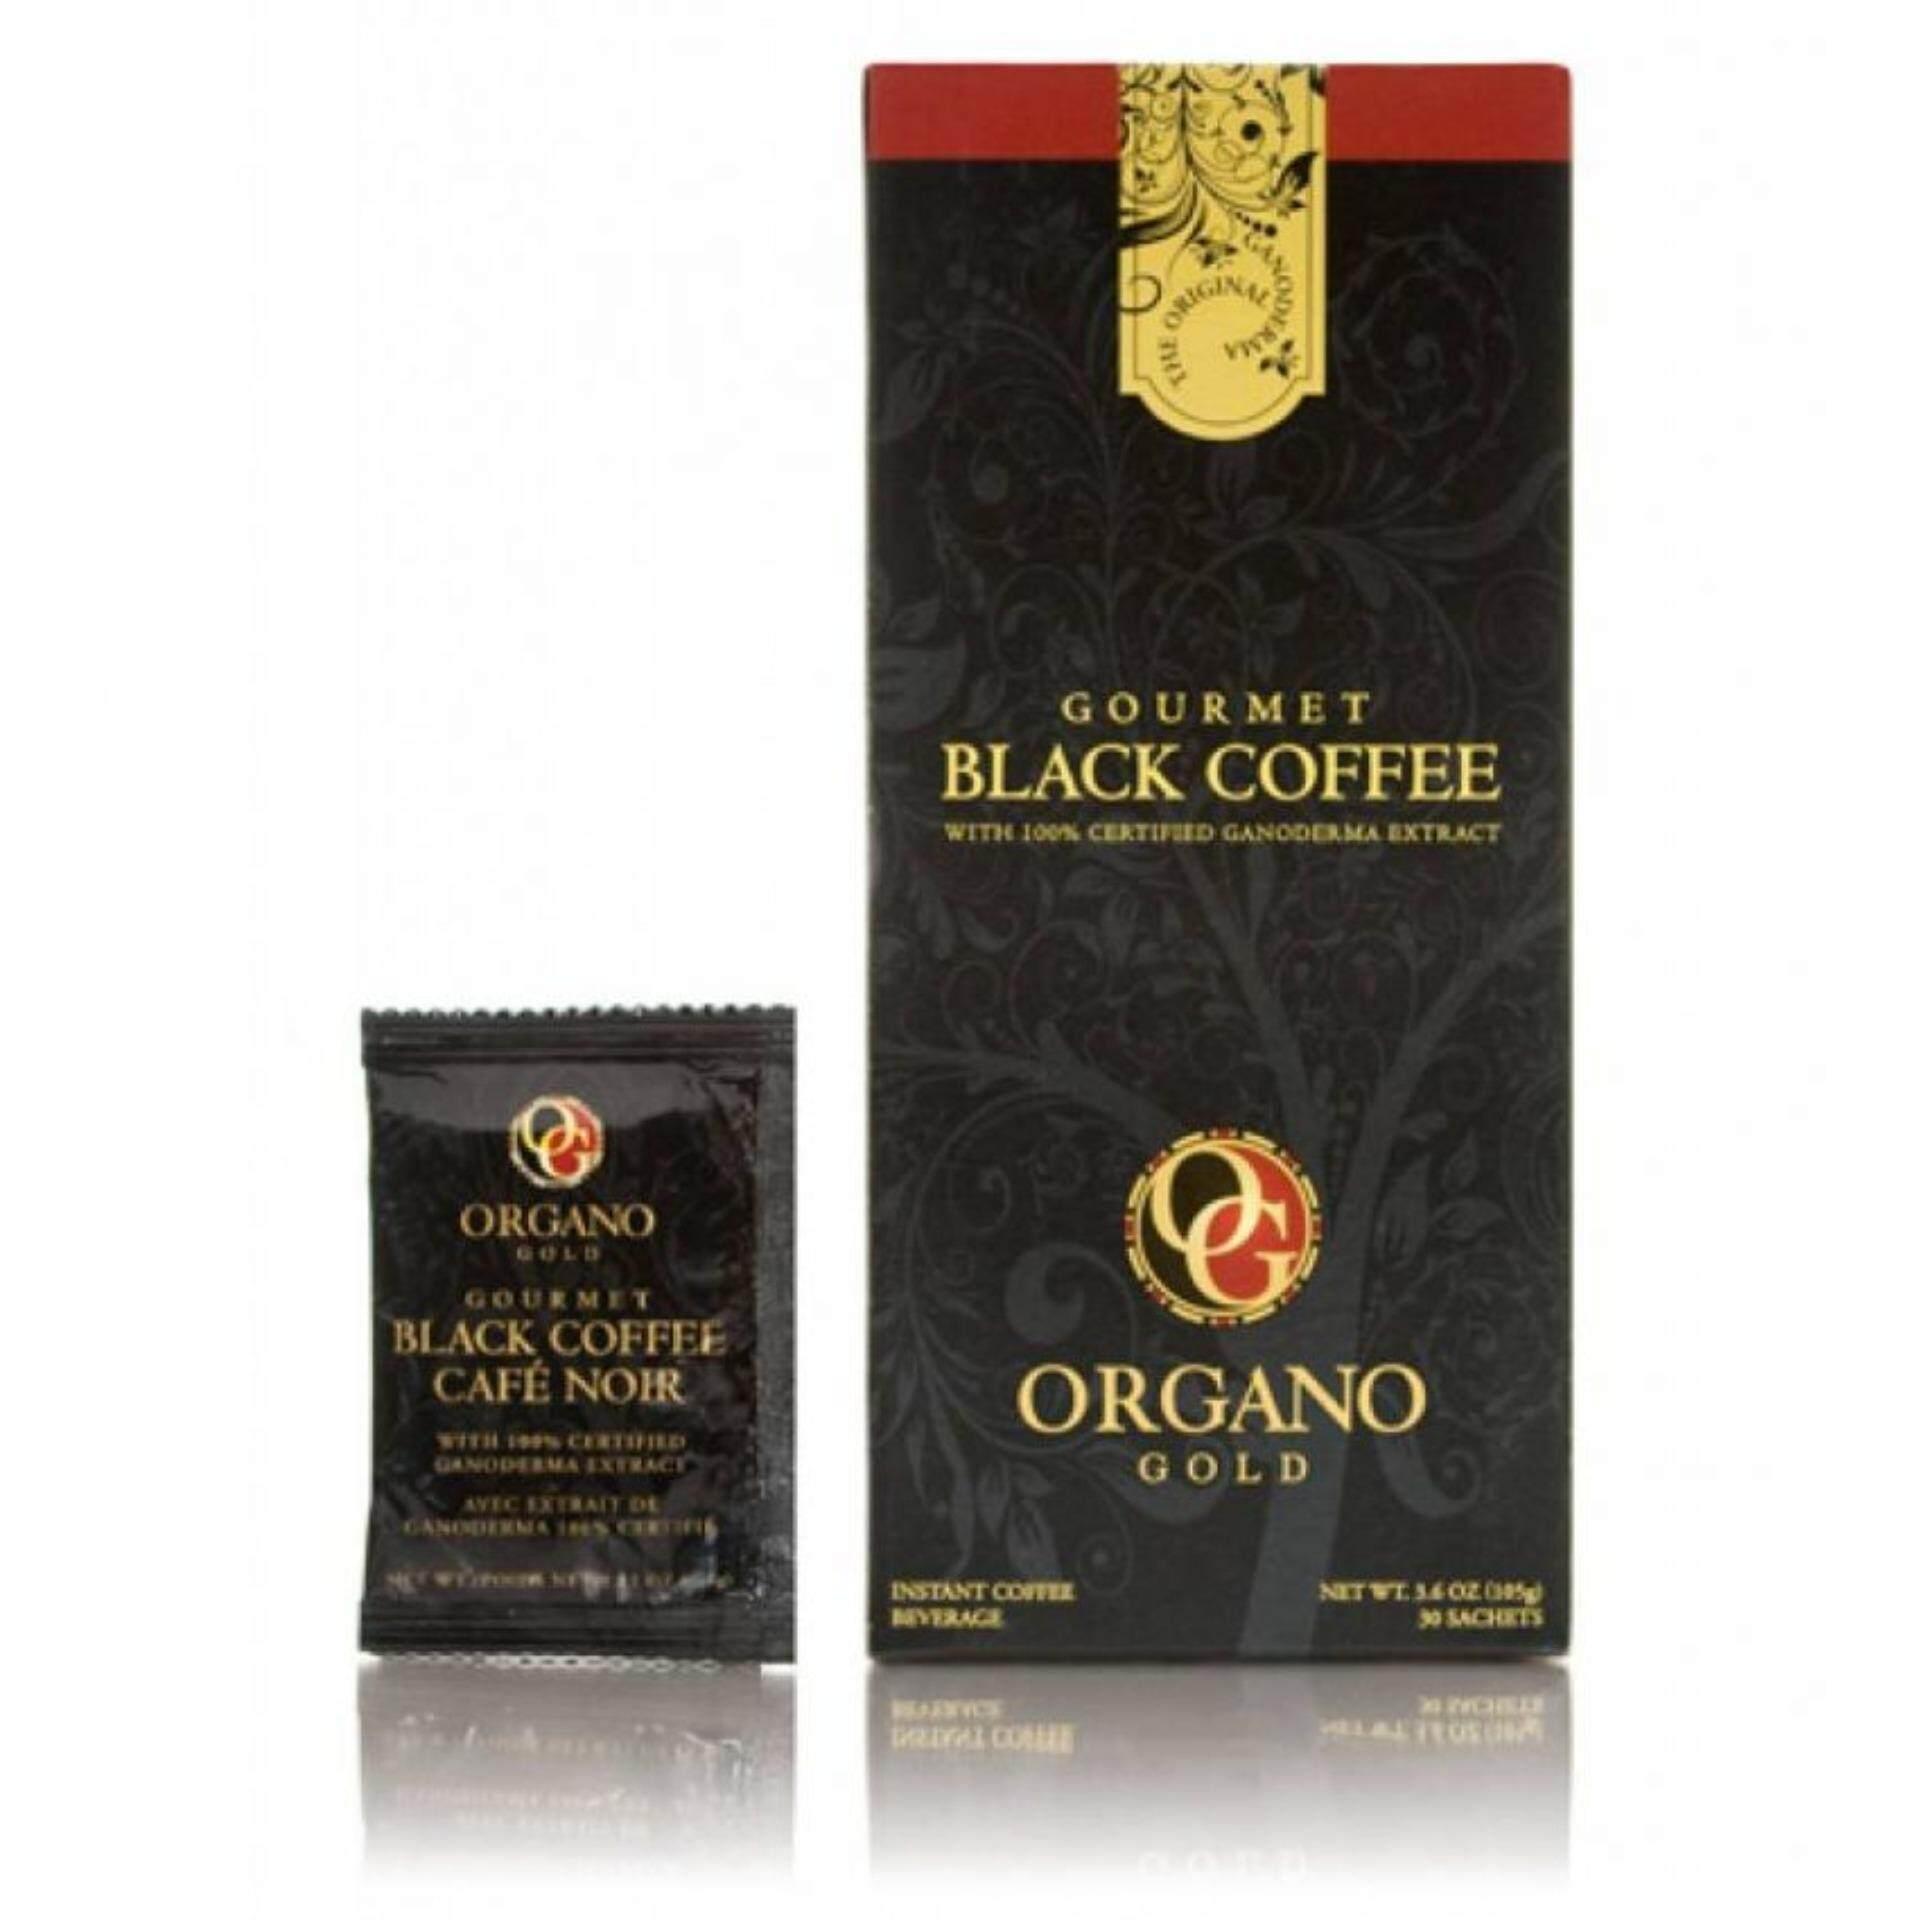 Gano  Black Coffee Organo Gold เห็ดหลินจือลดน้ำหนักลดความเครียด30ซอง